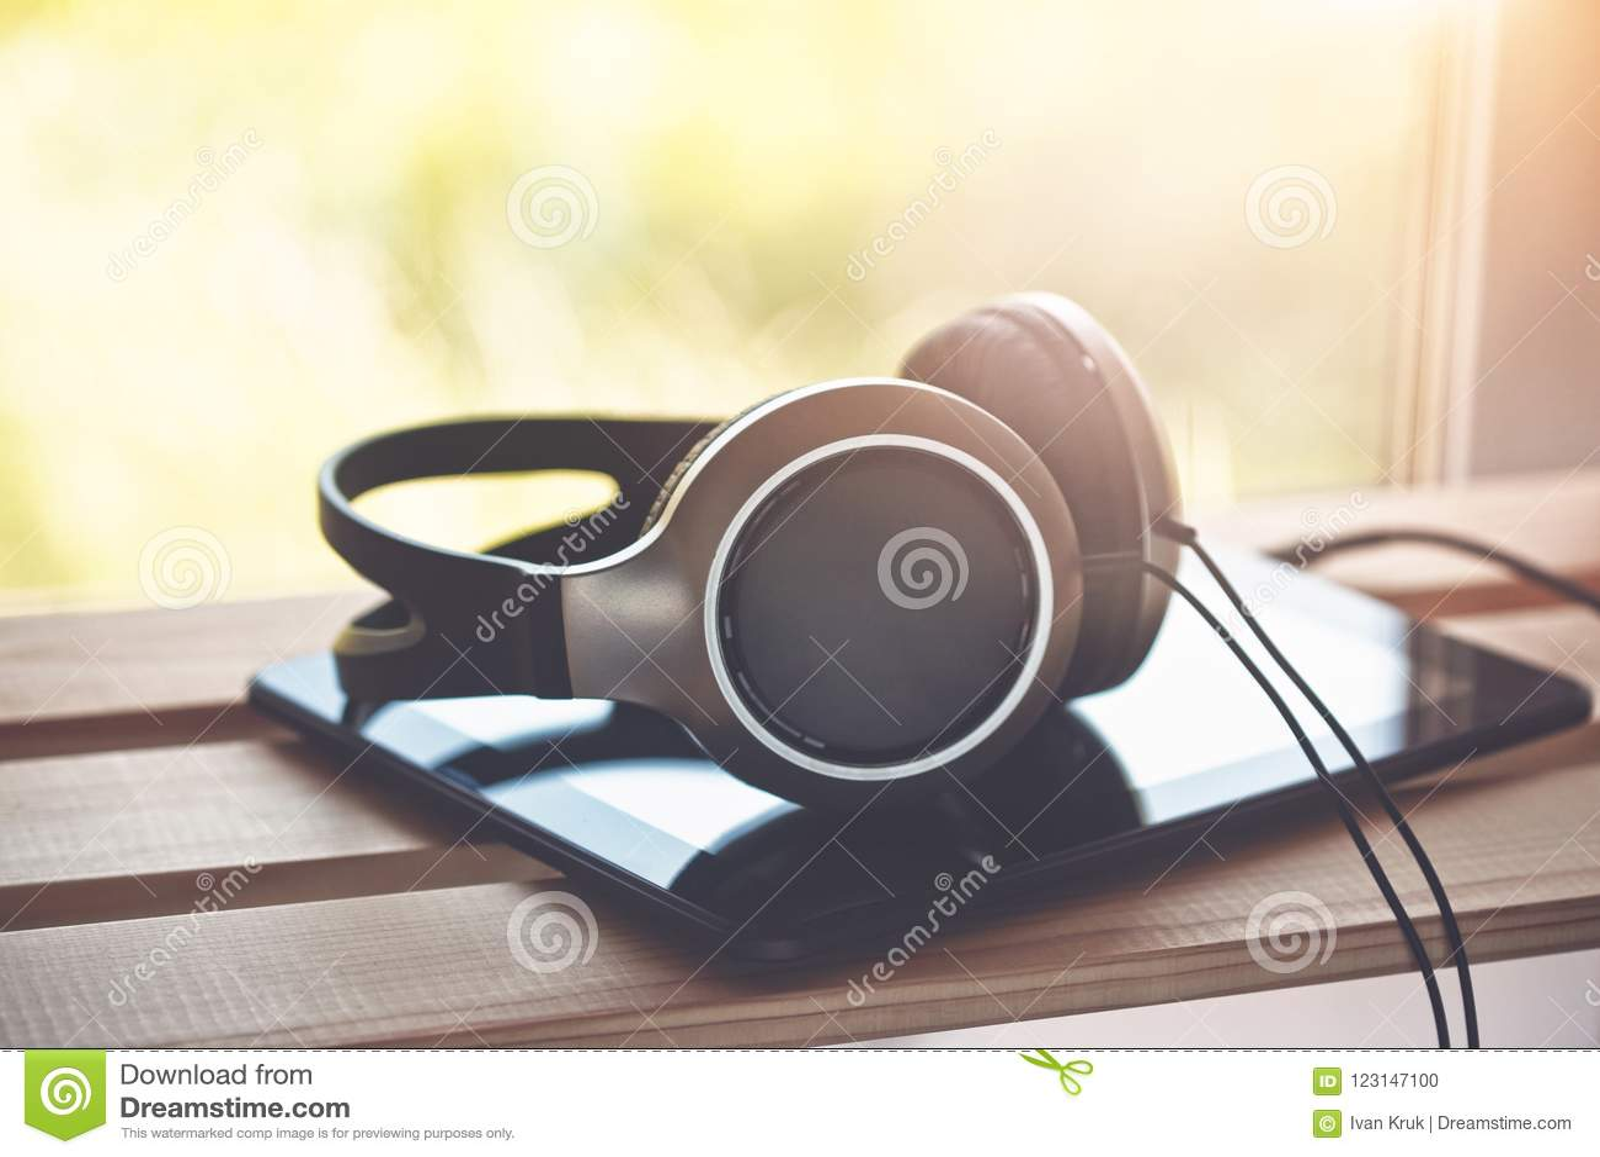 headphones with digital tablet computer